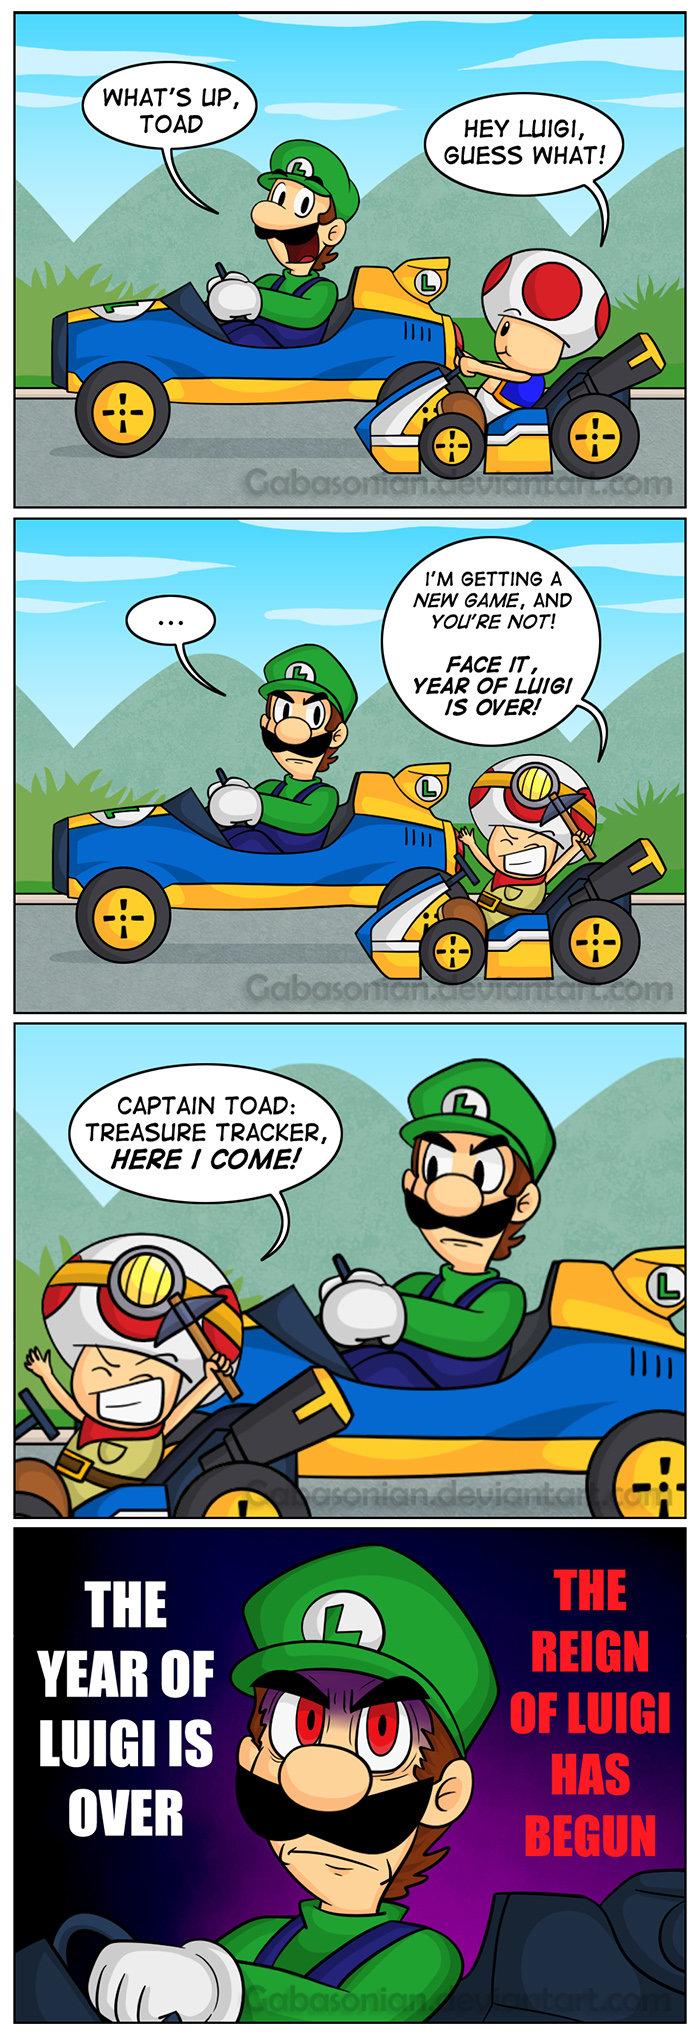 The Reign of Luigi. sauce: gabasonian.deviantart.com/art/The-Reign-of-Luig.... NEN GAME. YOU' RE NO T! FACE m, YEAR arr Limite CAPTAIN TOAD: TREASURE TRACKER, luigi